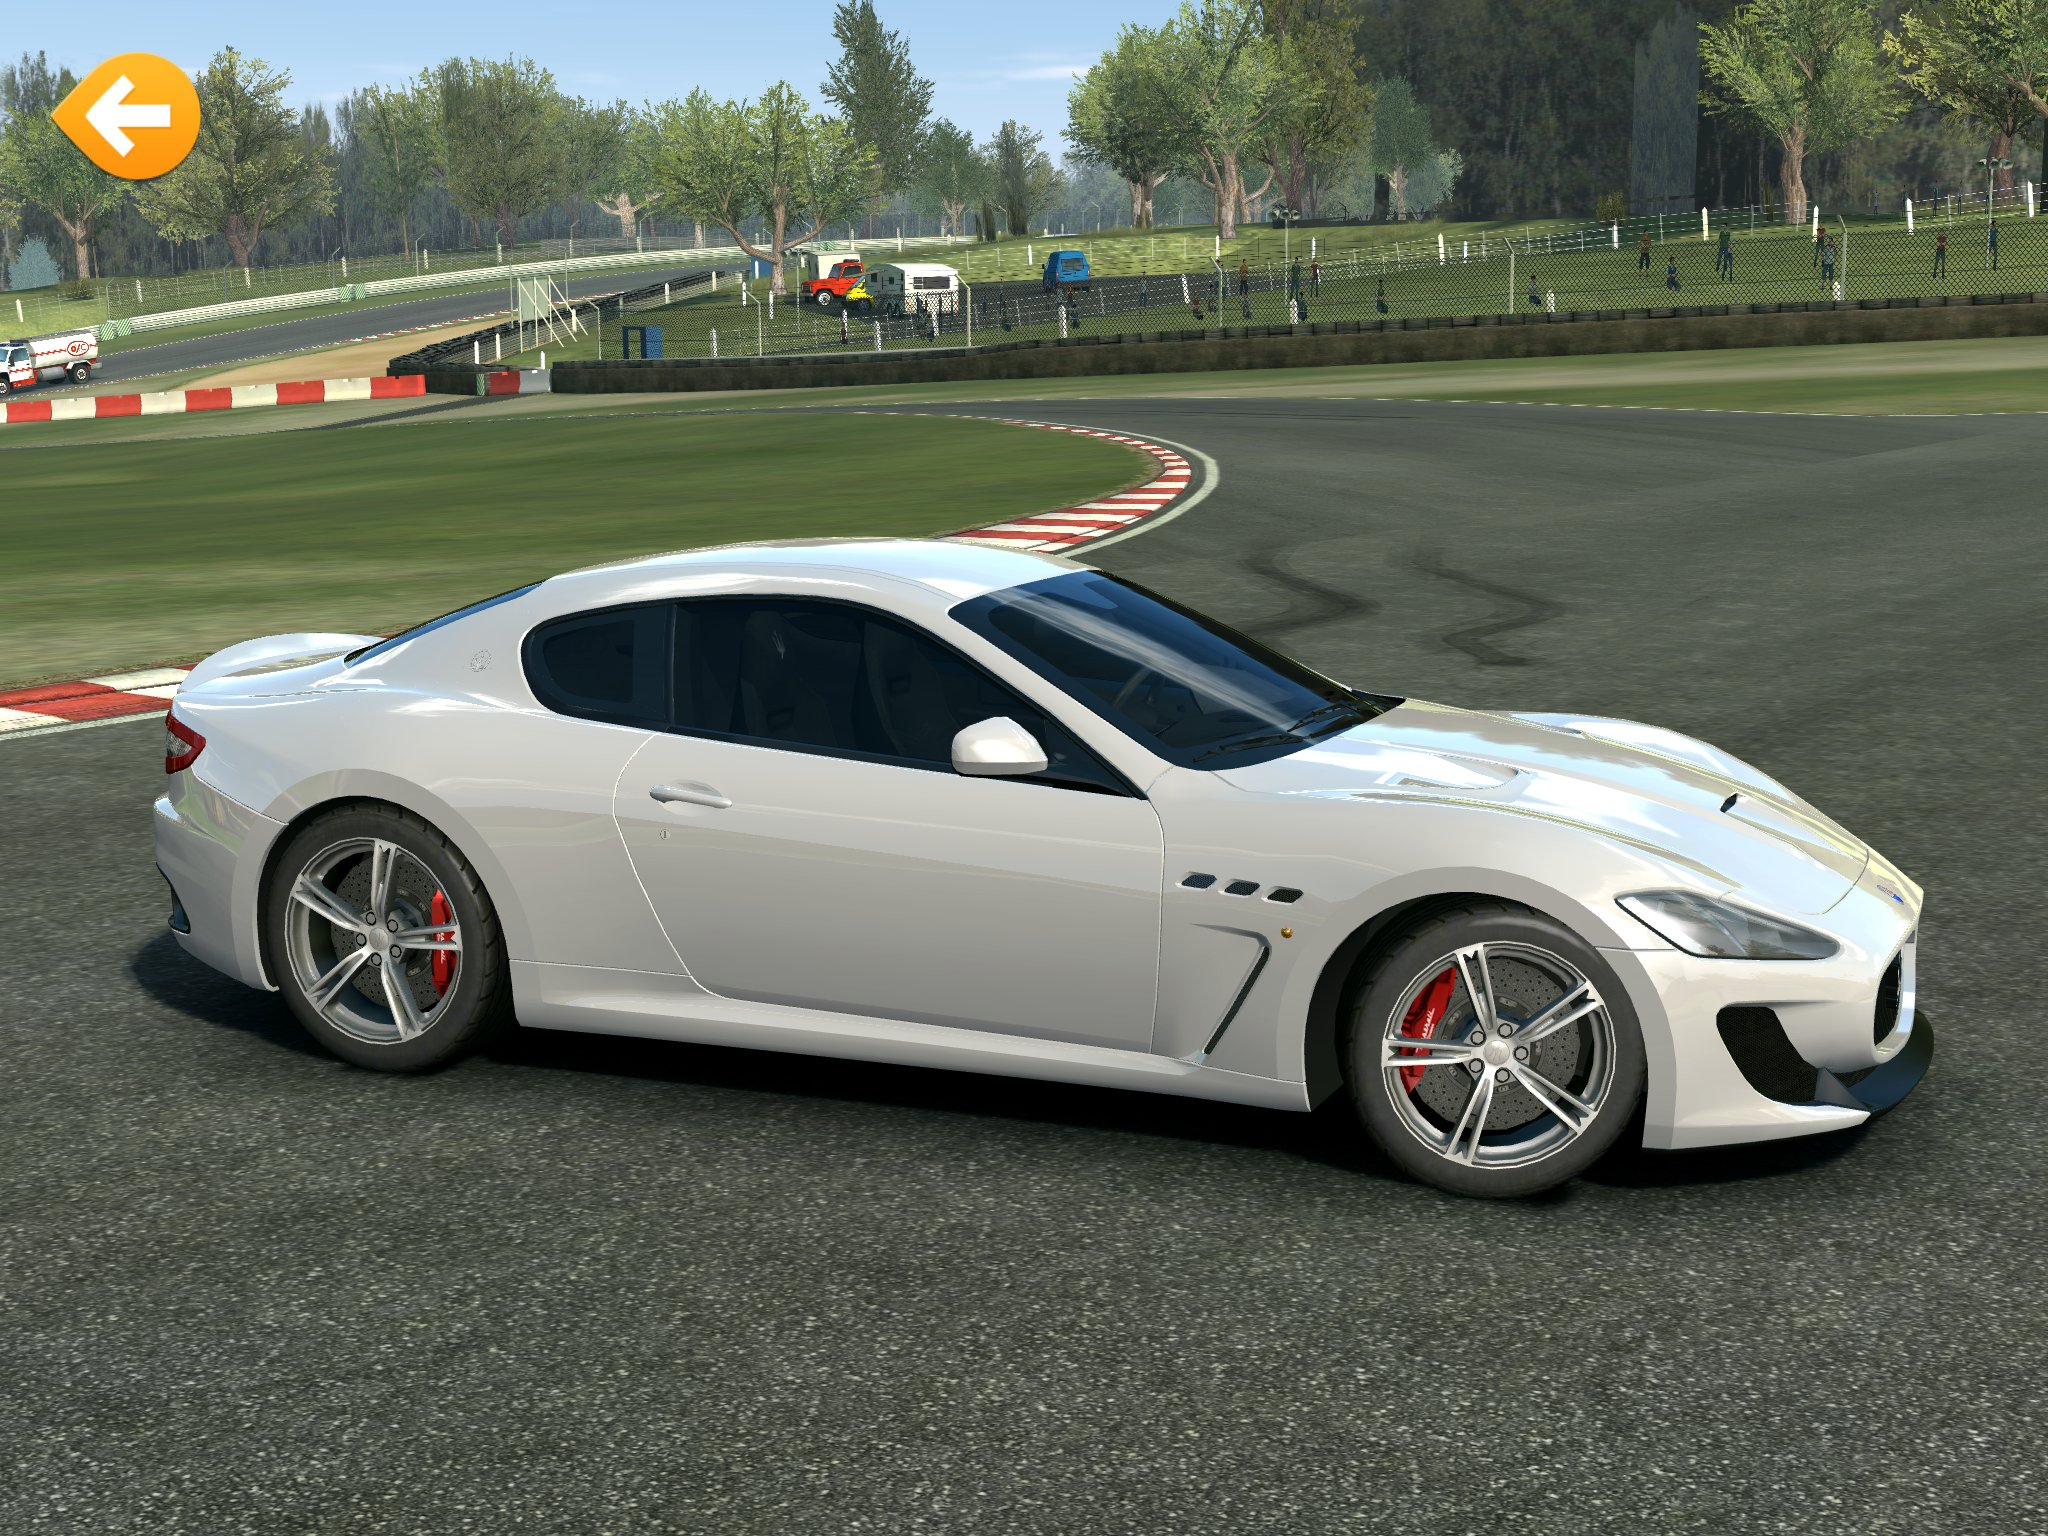 39 real racing 3 39 gets new maserati cars and the ferrari laferrari toucharcade. Black Bedroom Furniture Sets. Home Design Ideas